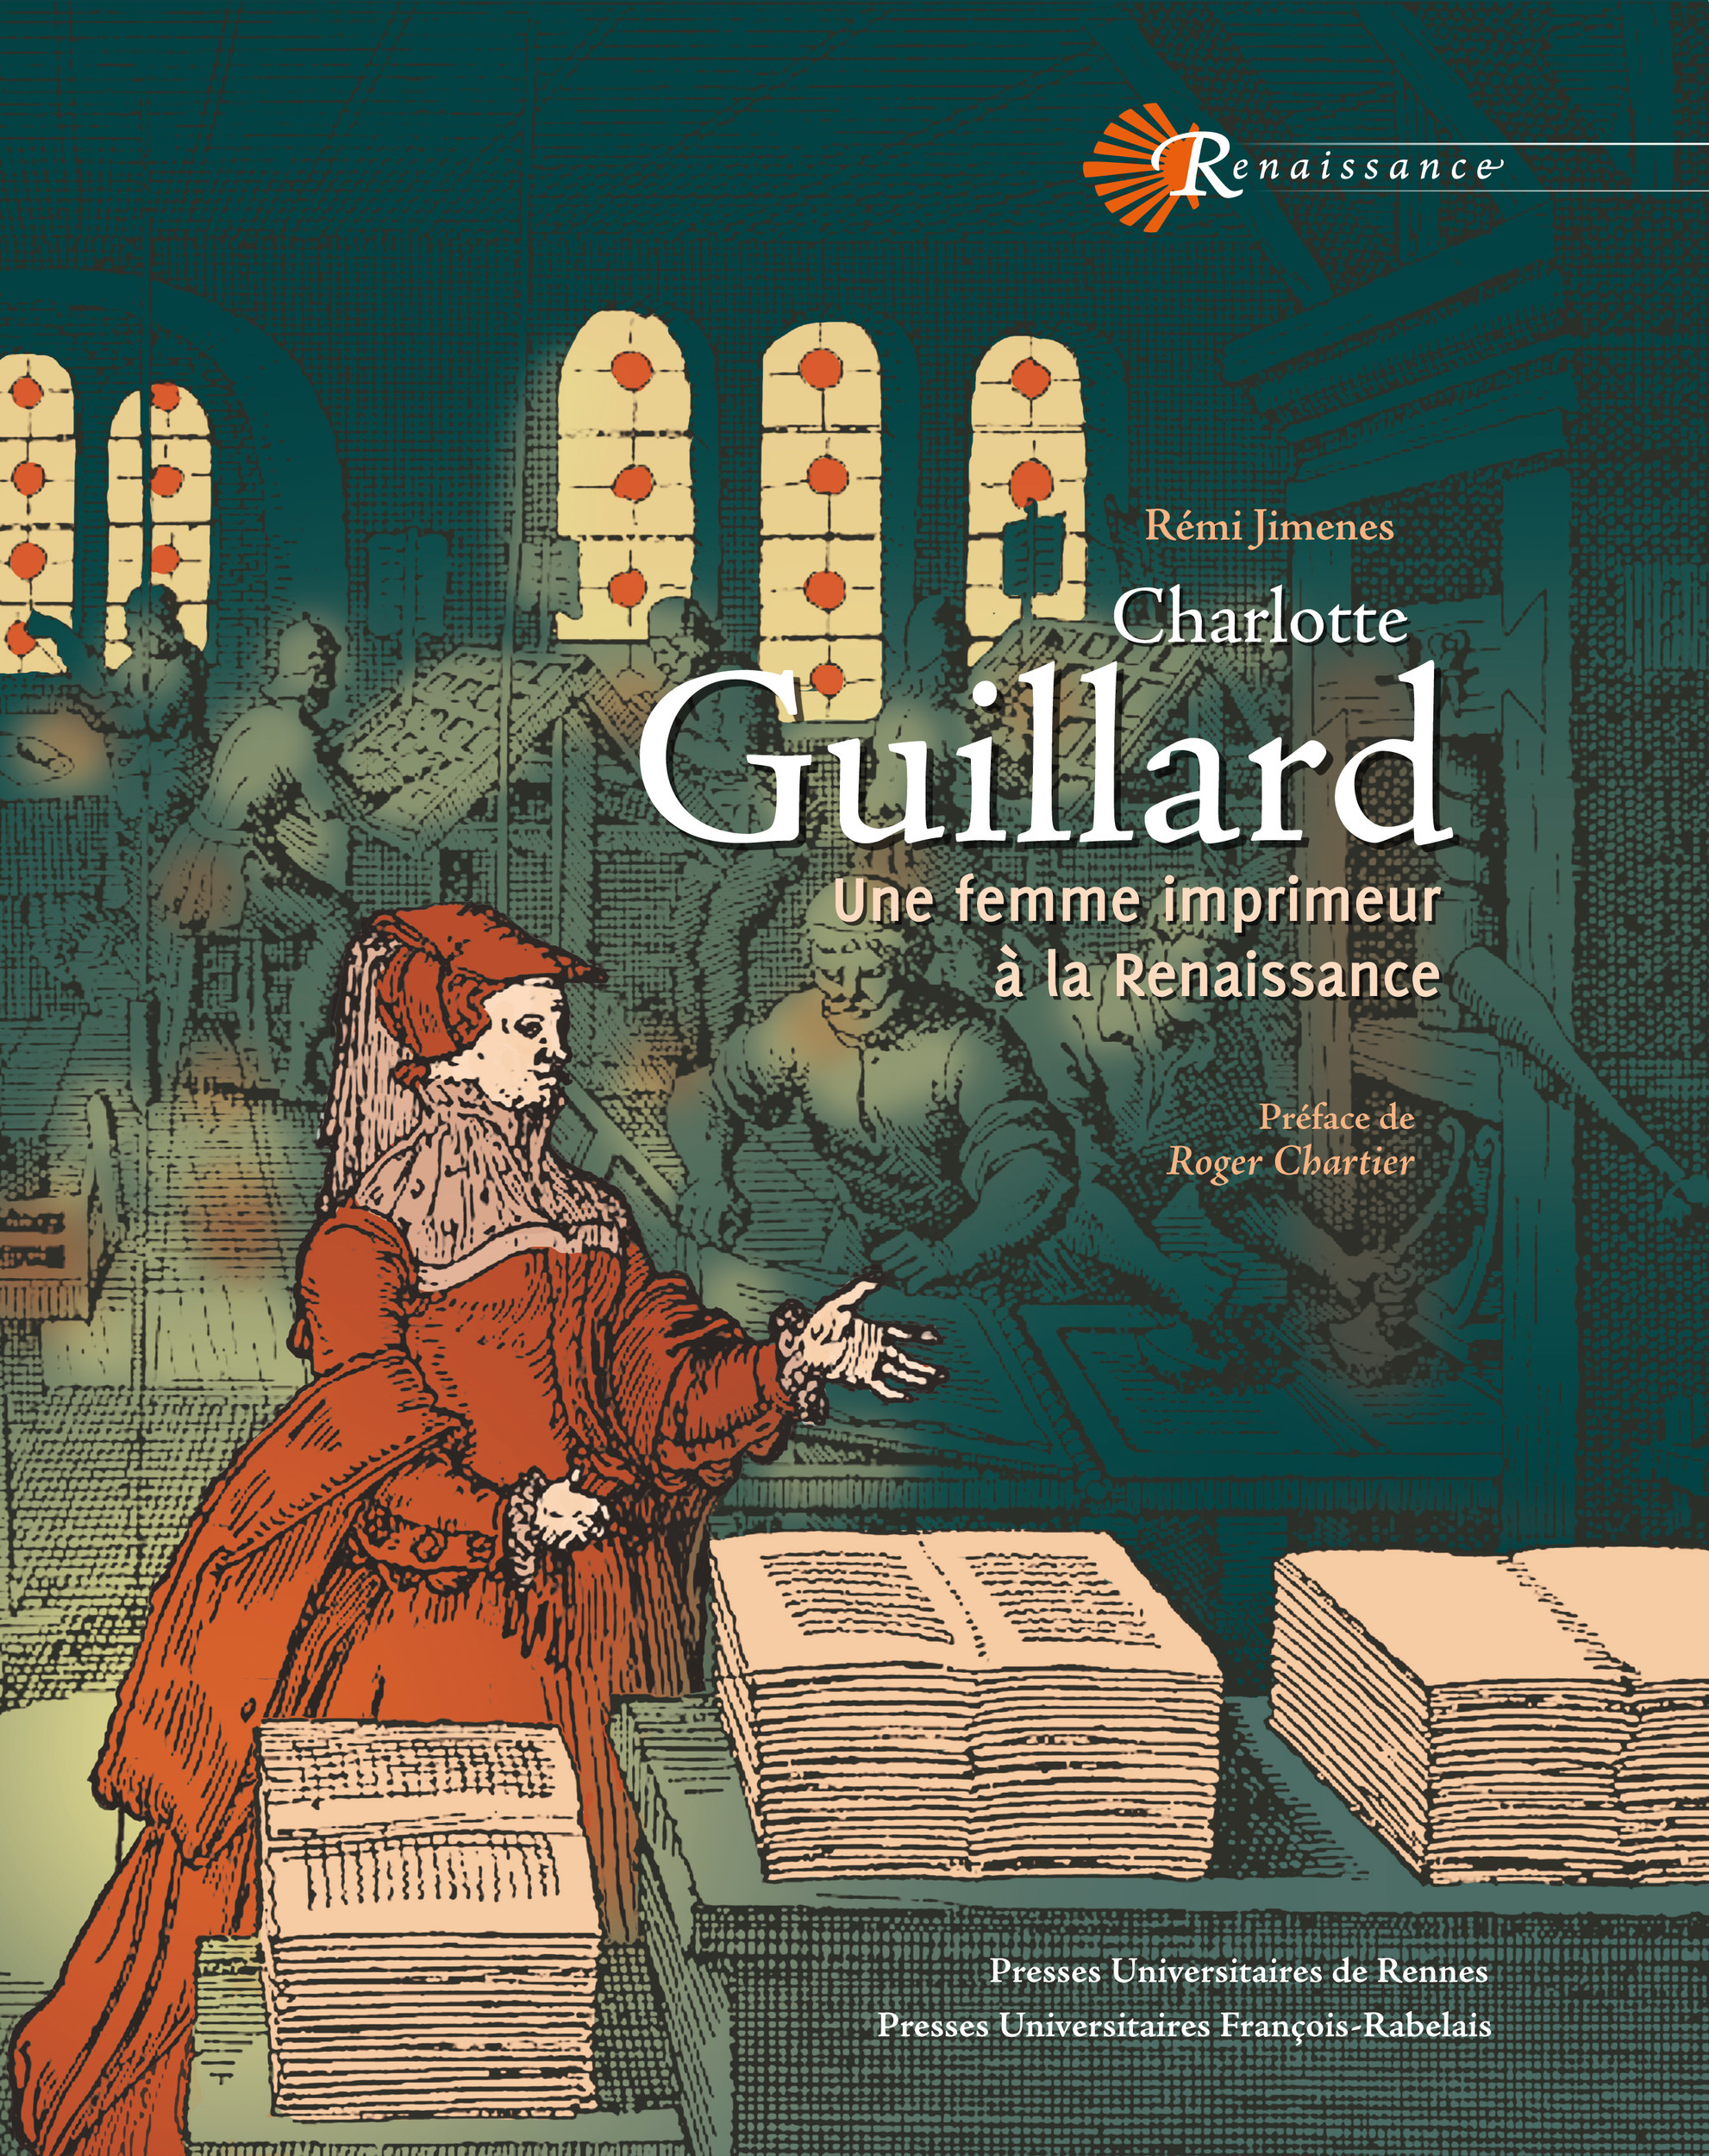 Charlotte Guillard